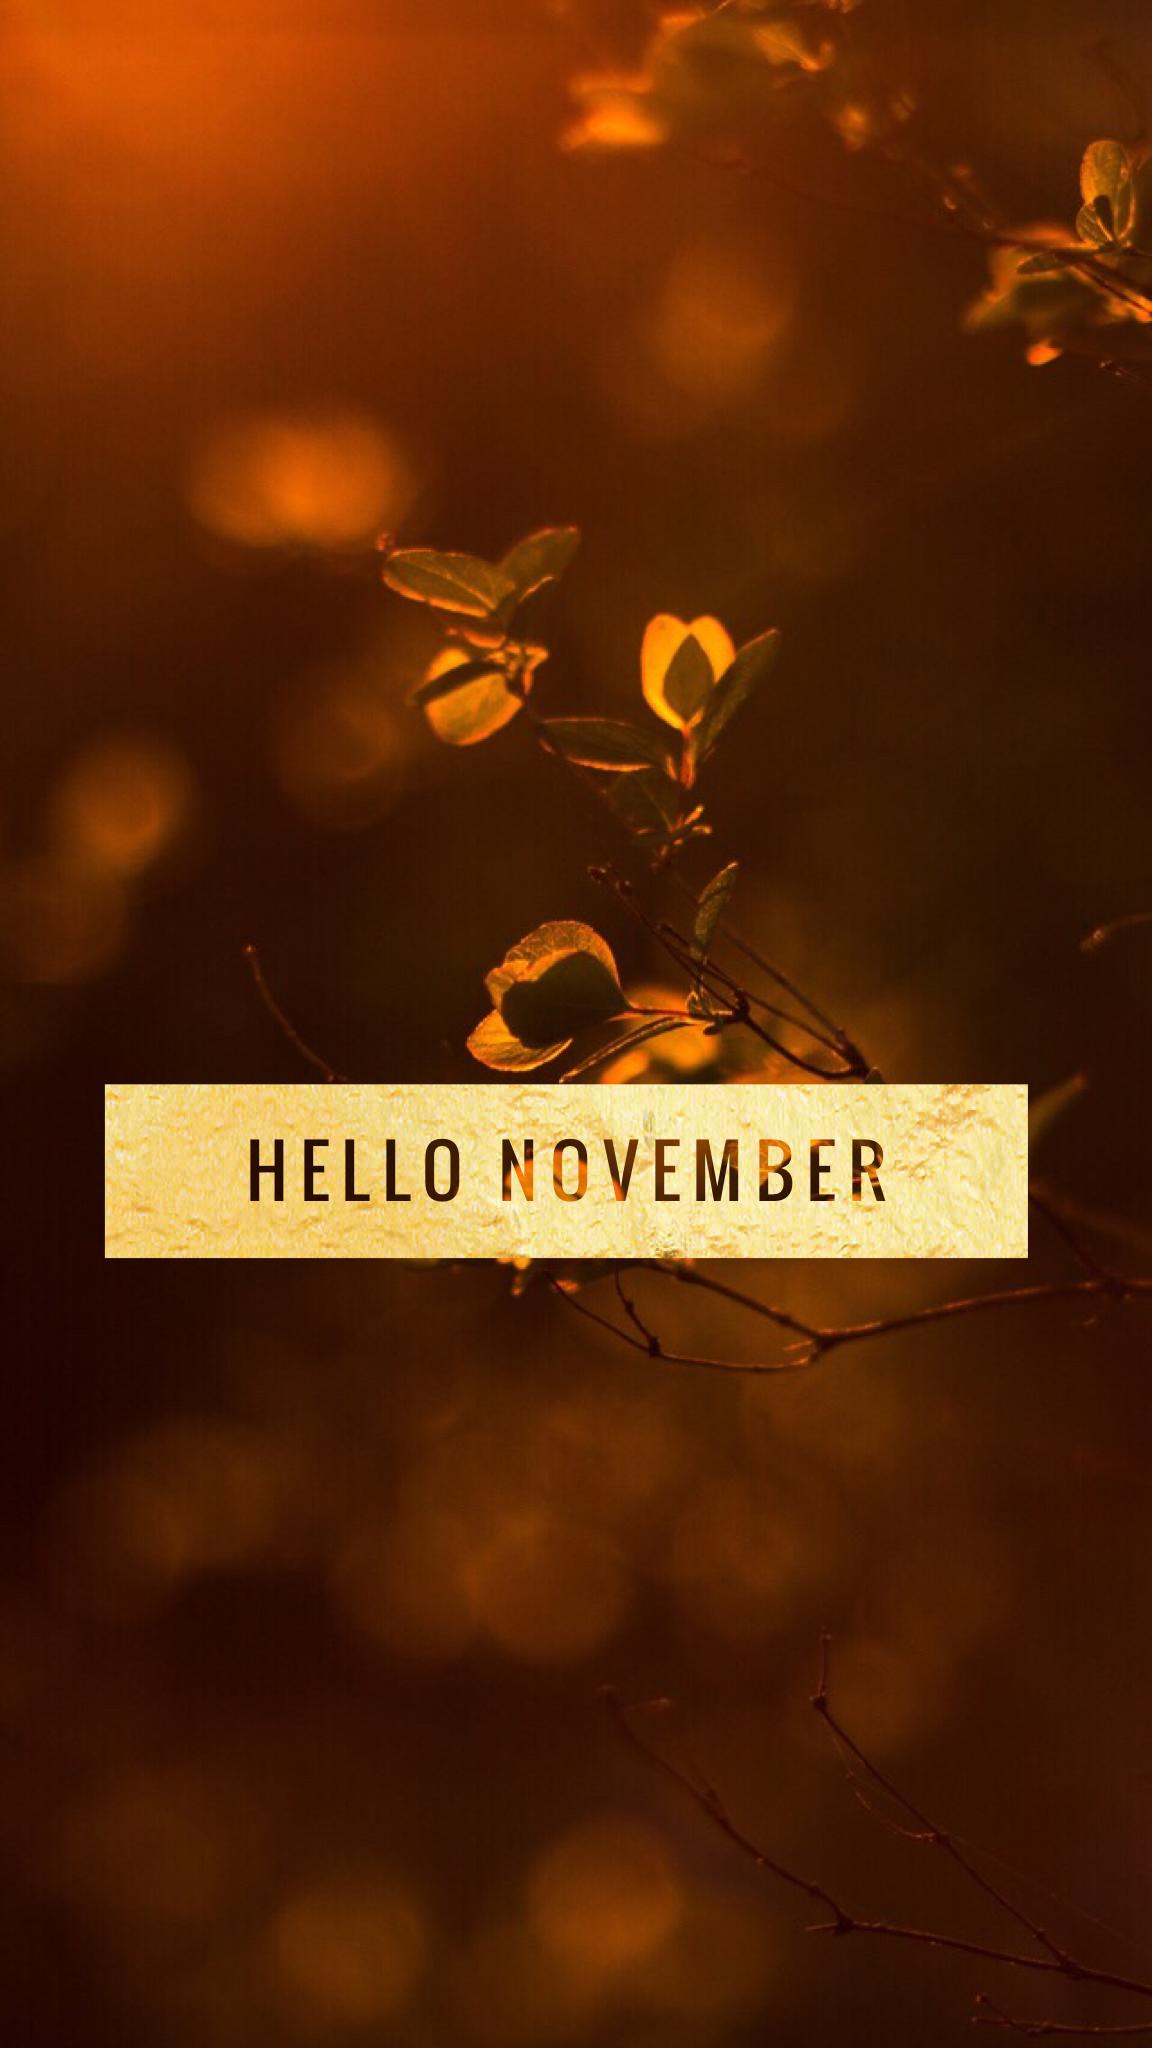 #hello #november #quote #autumn #harvest #wallpaper #iphone #hellonovemberwallpaper